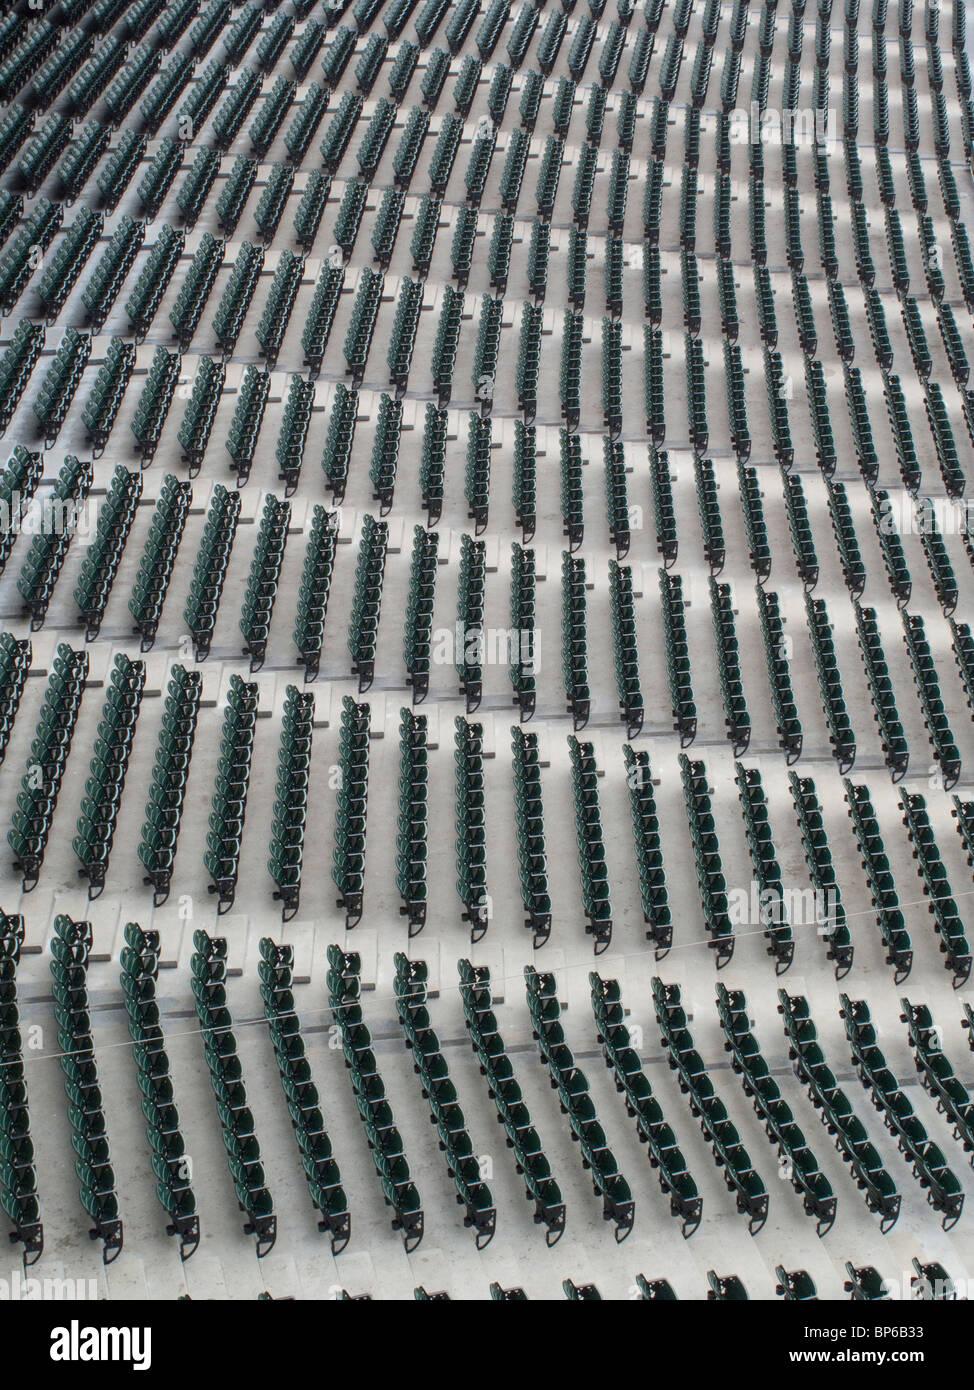 Abstract photos of stadium seats - Stock Image